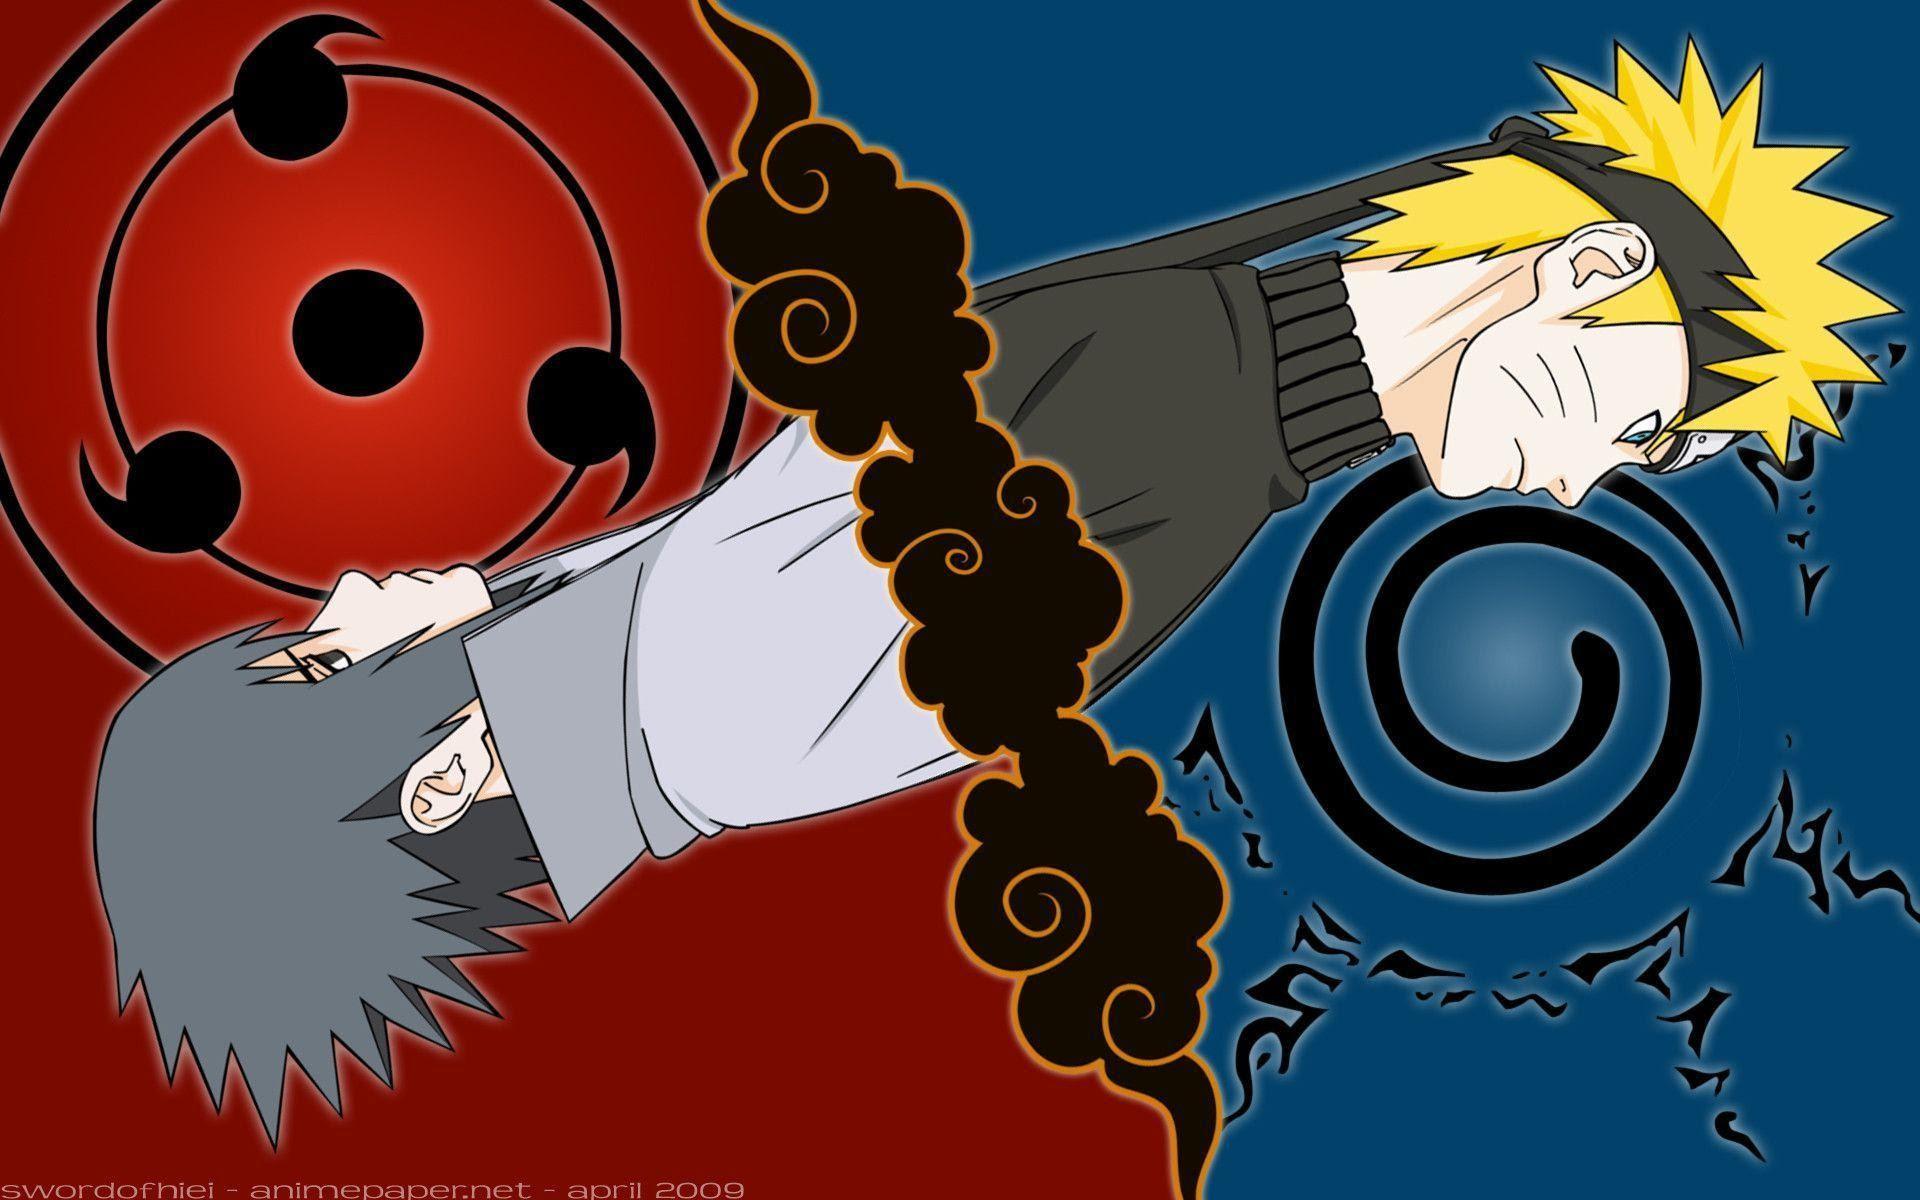 Unduh 680 Wallpaper Tumblr Naruto Gratis Terbaik